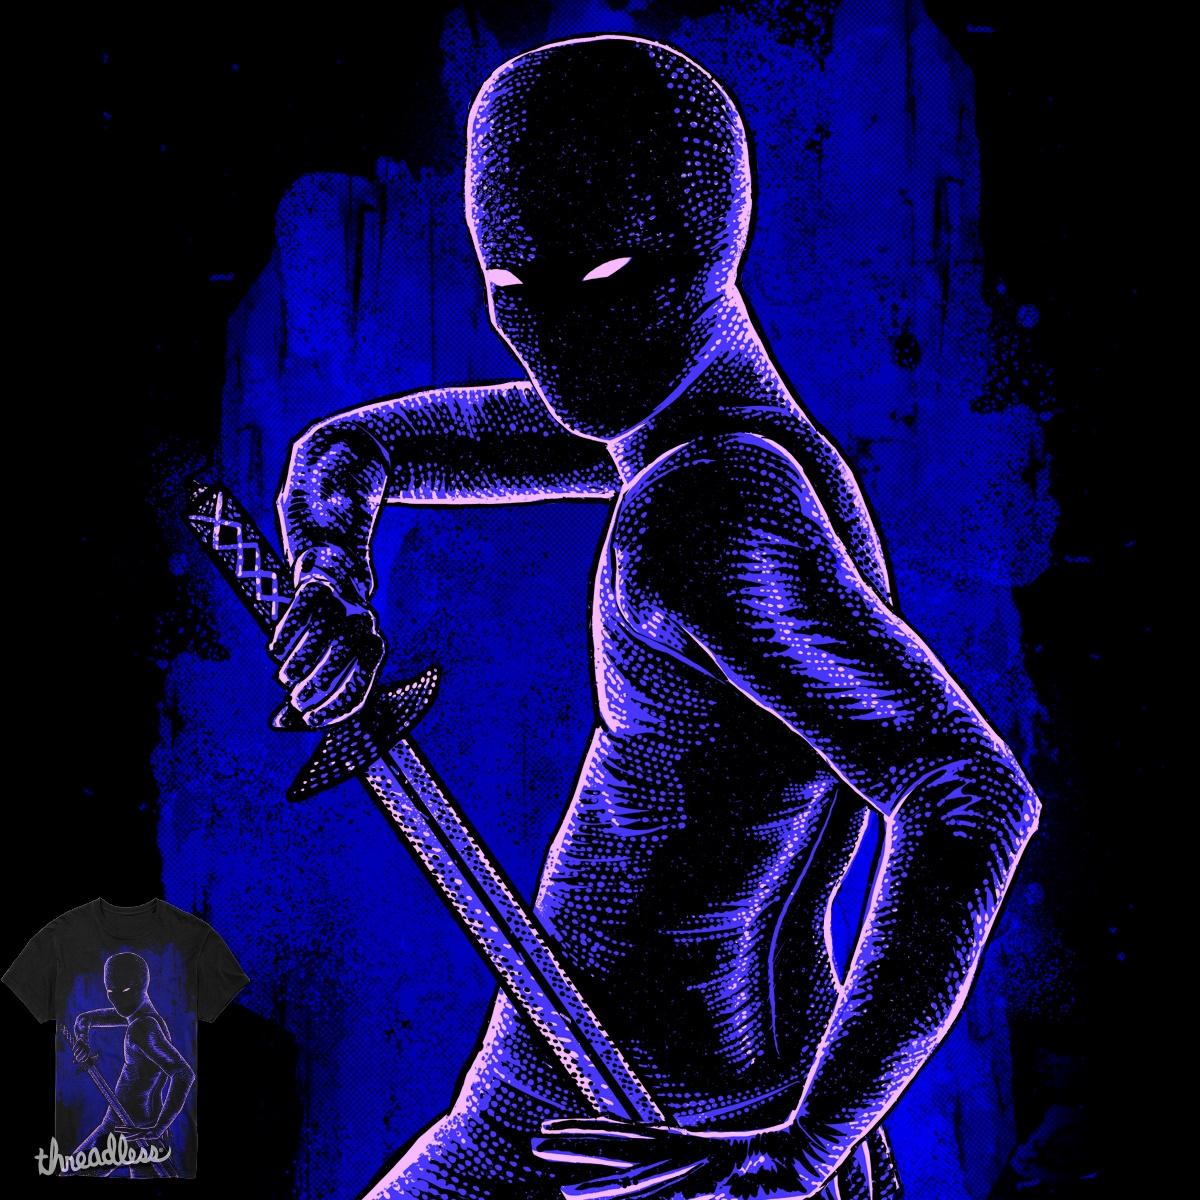 Blue Ninja by barmalisiRTB on Threadless